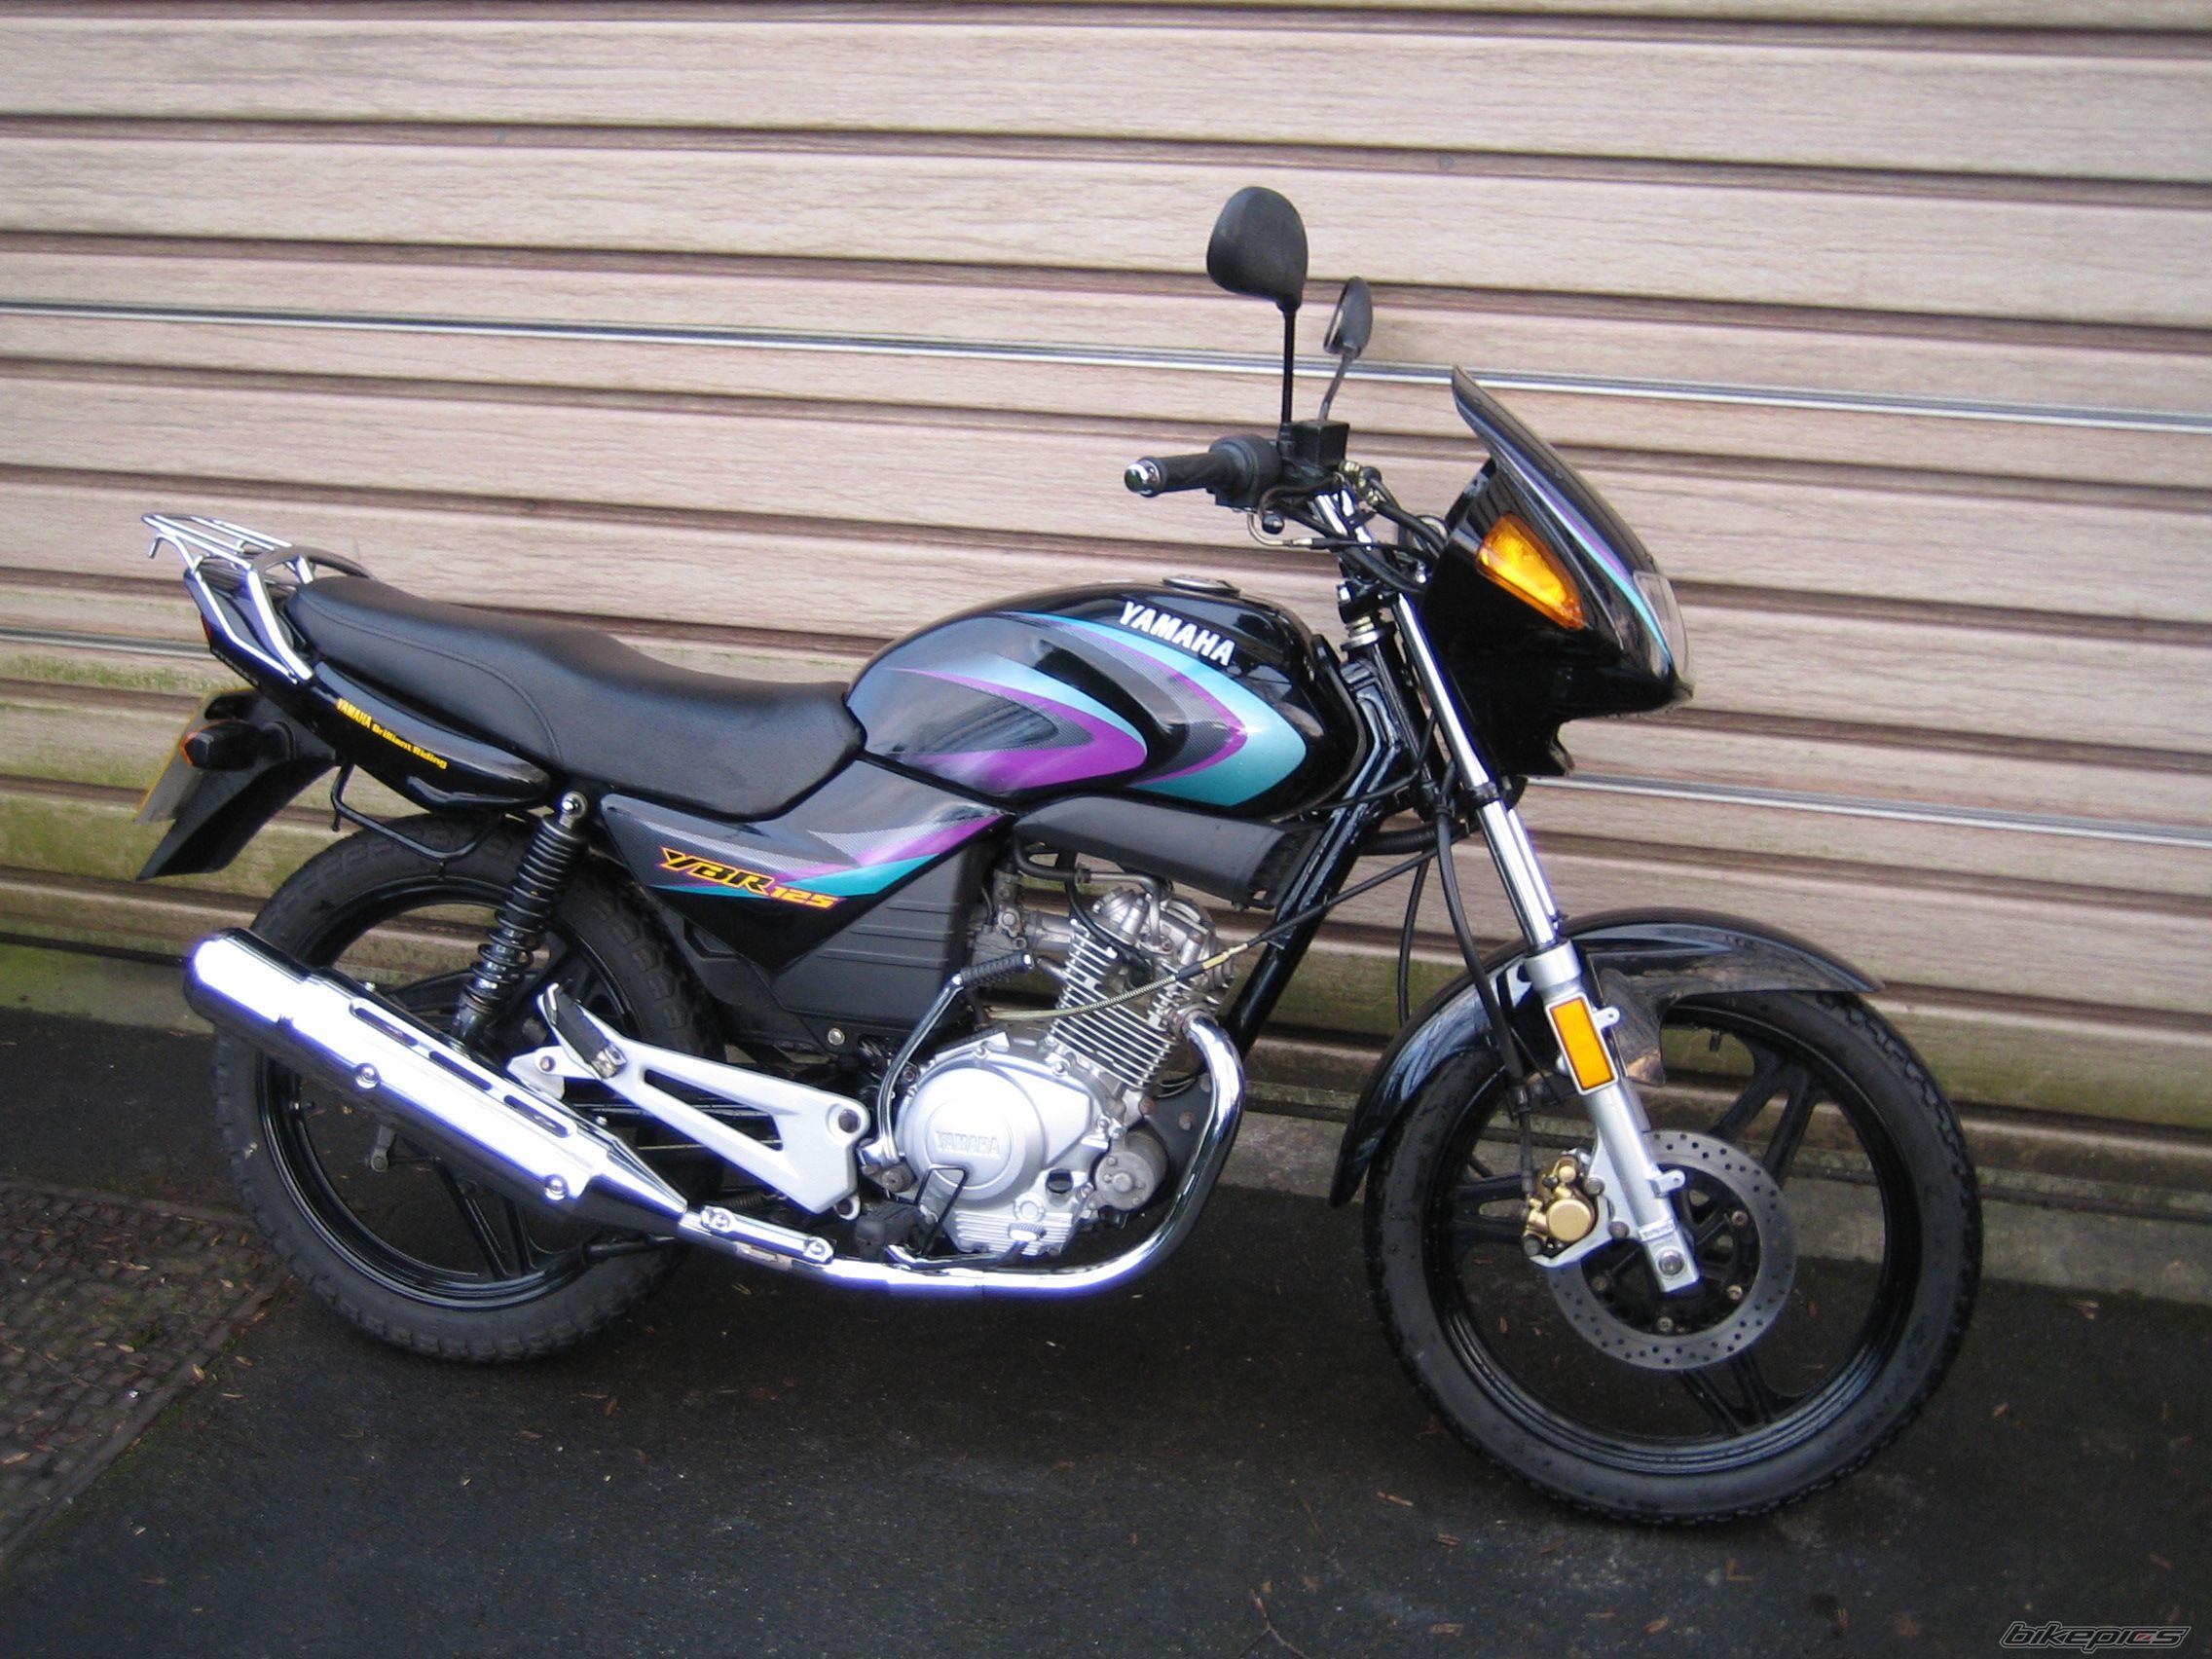 2005 Yamaha YBR 125: pics, specs and information